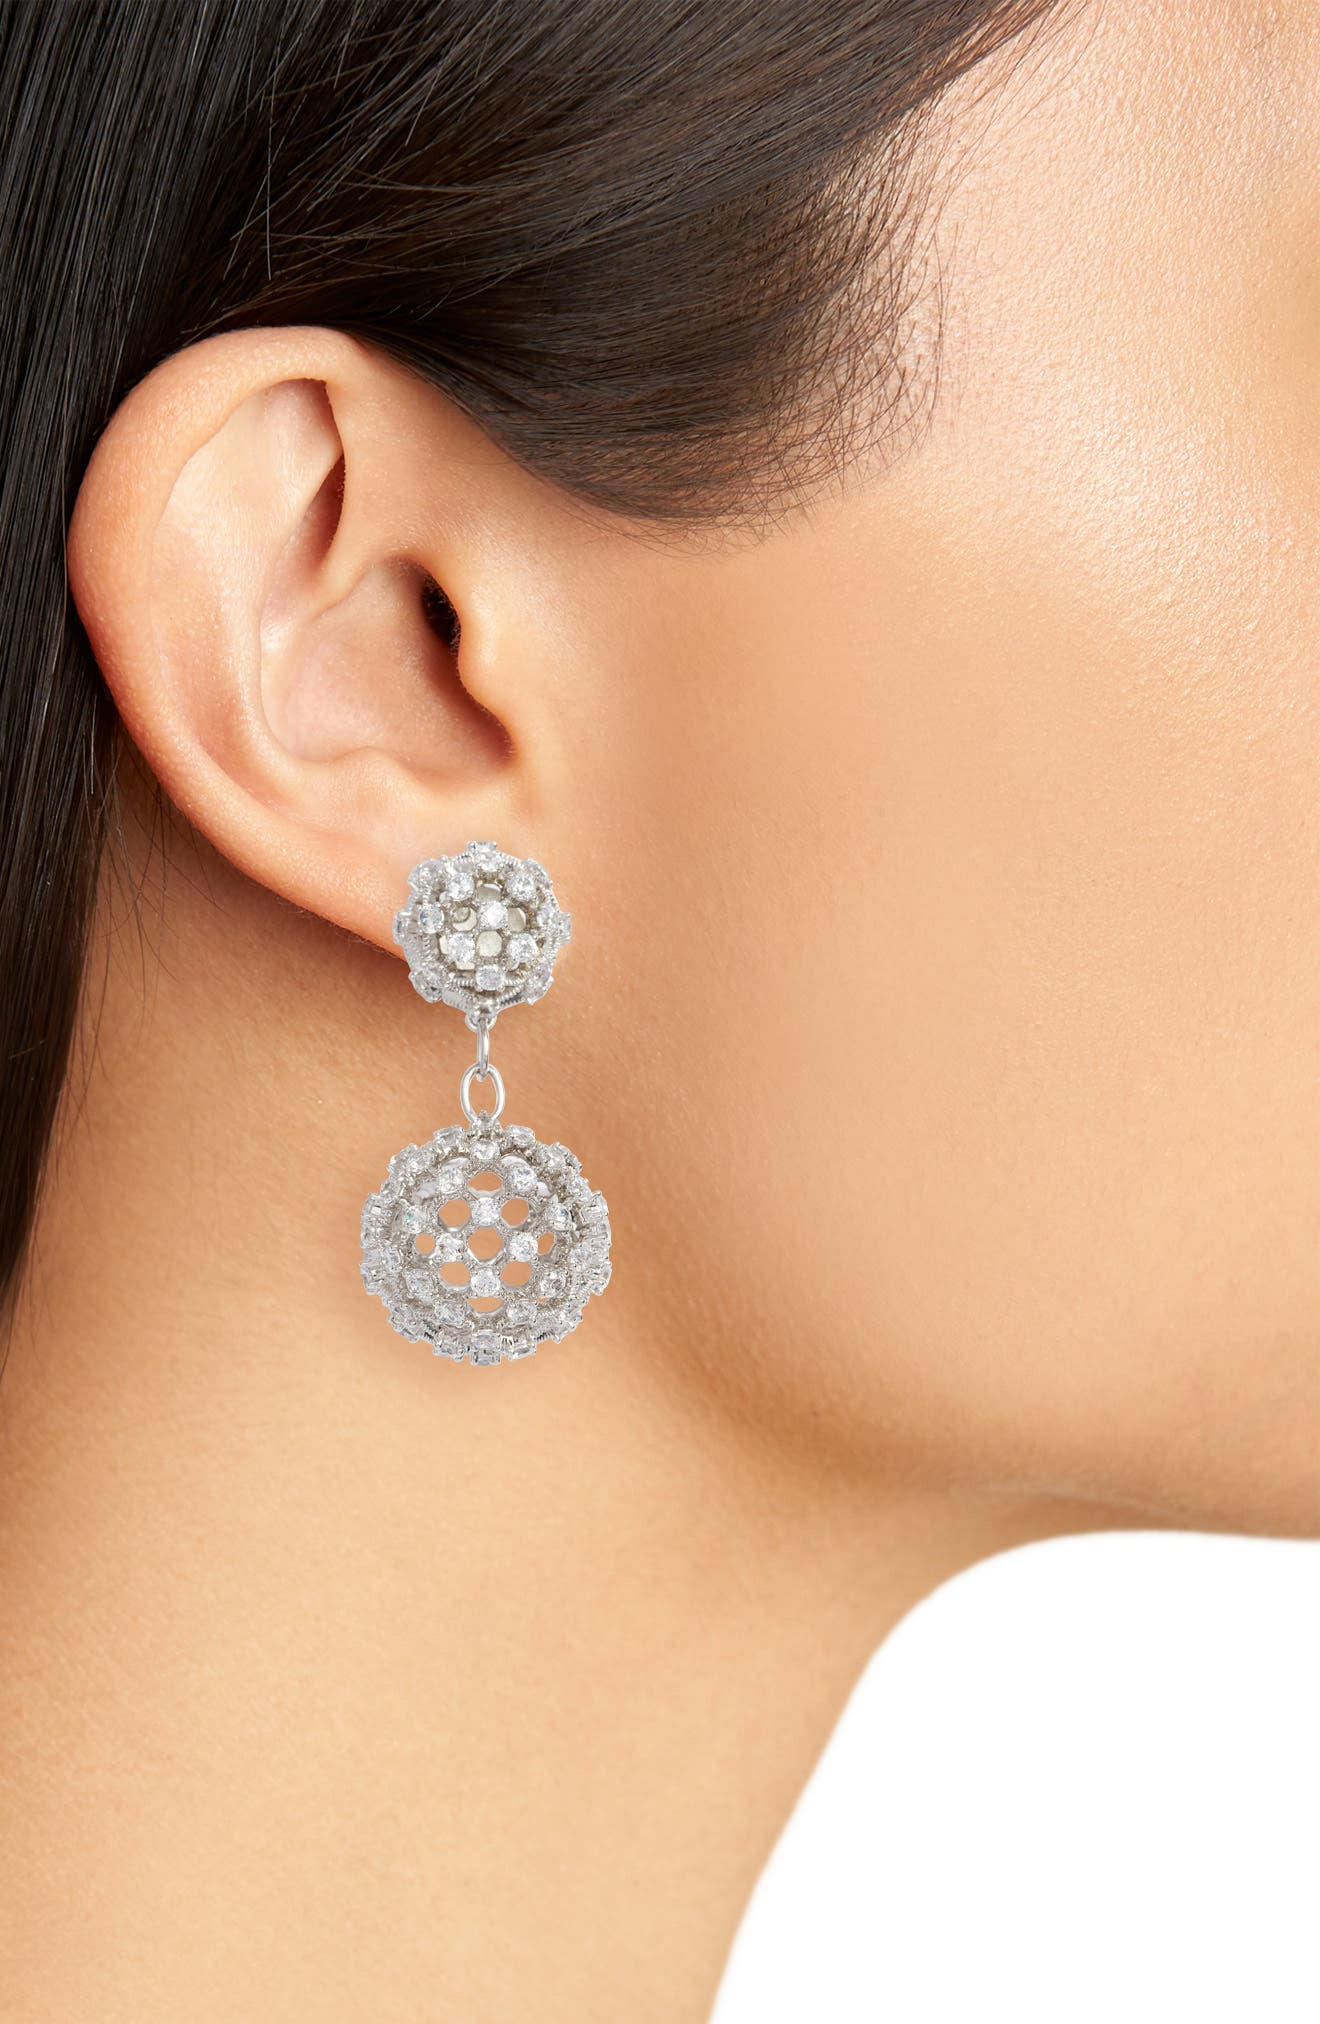 Cubic Zirconia Double Drop Earrings,                             Alternate thumbnail 2, color,                             040